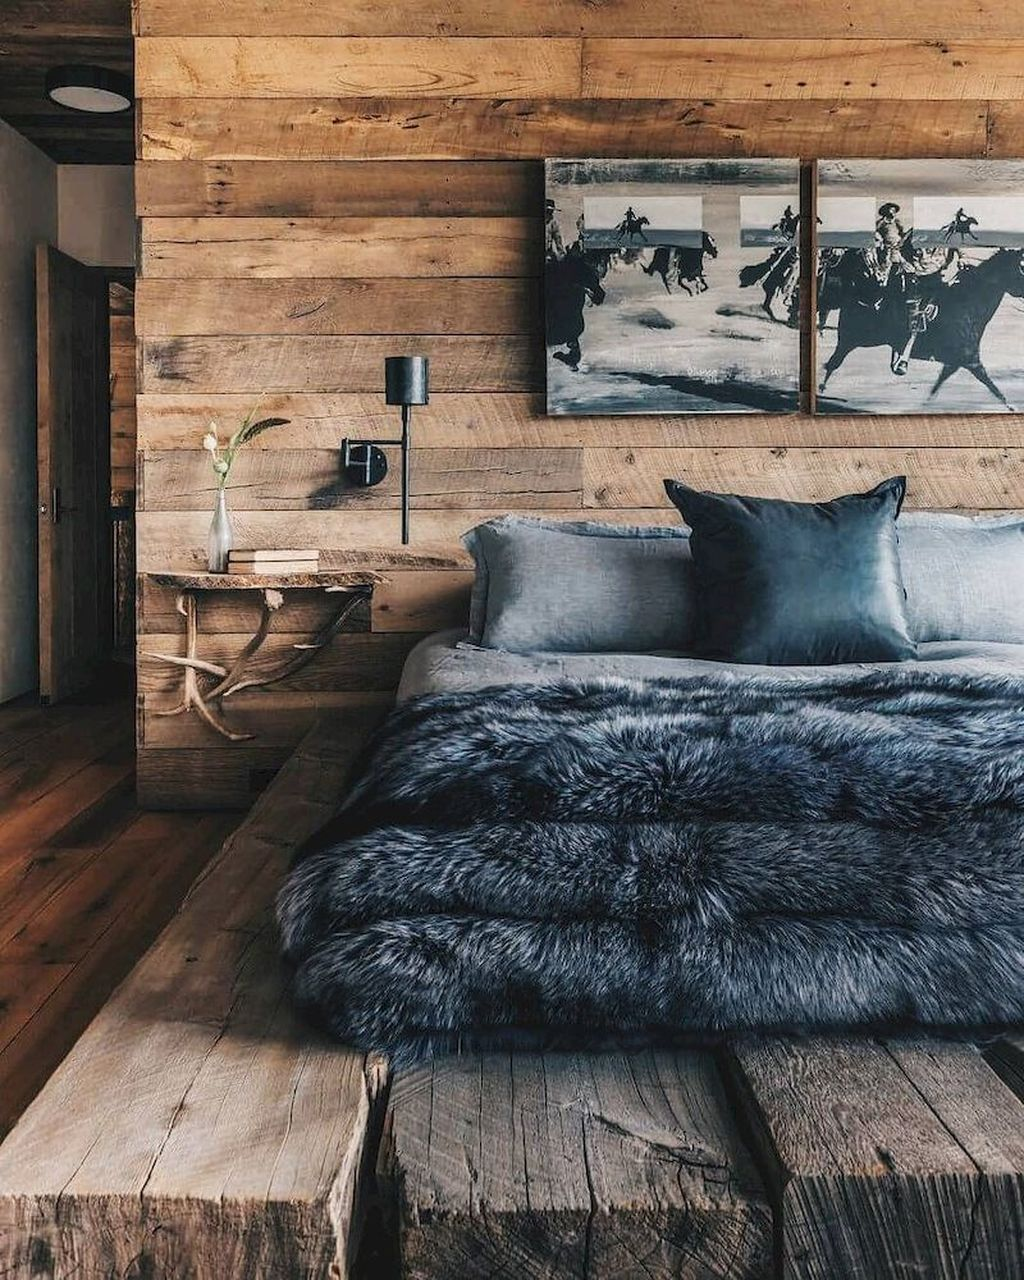 34 Gorgeous Rustic Bedroom Design And Decoration Ideas In 2020 Rustic Bedroom Design Rustic Bedroom Furniture Bedroom Design